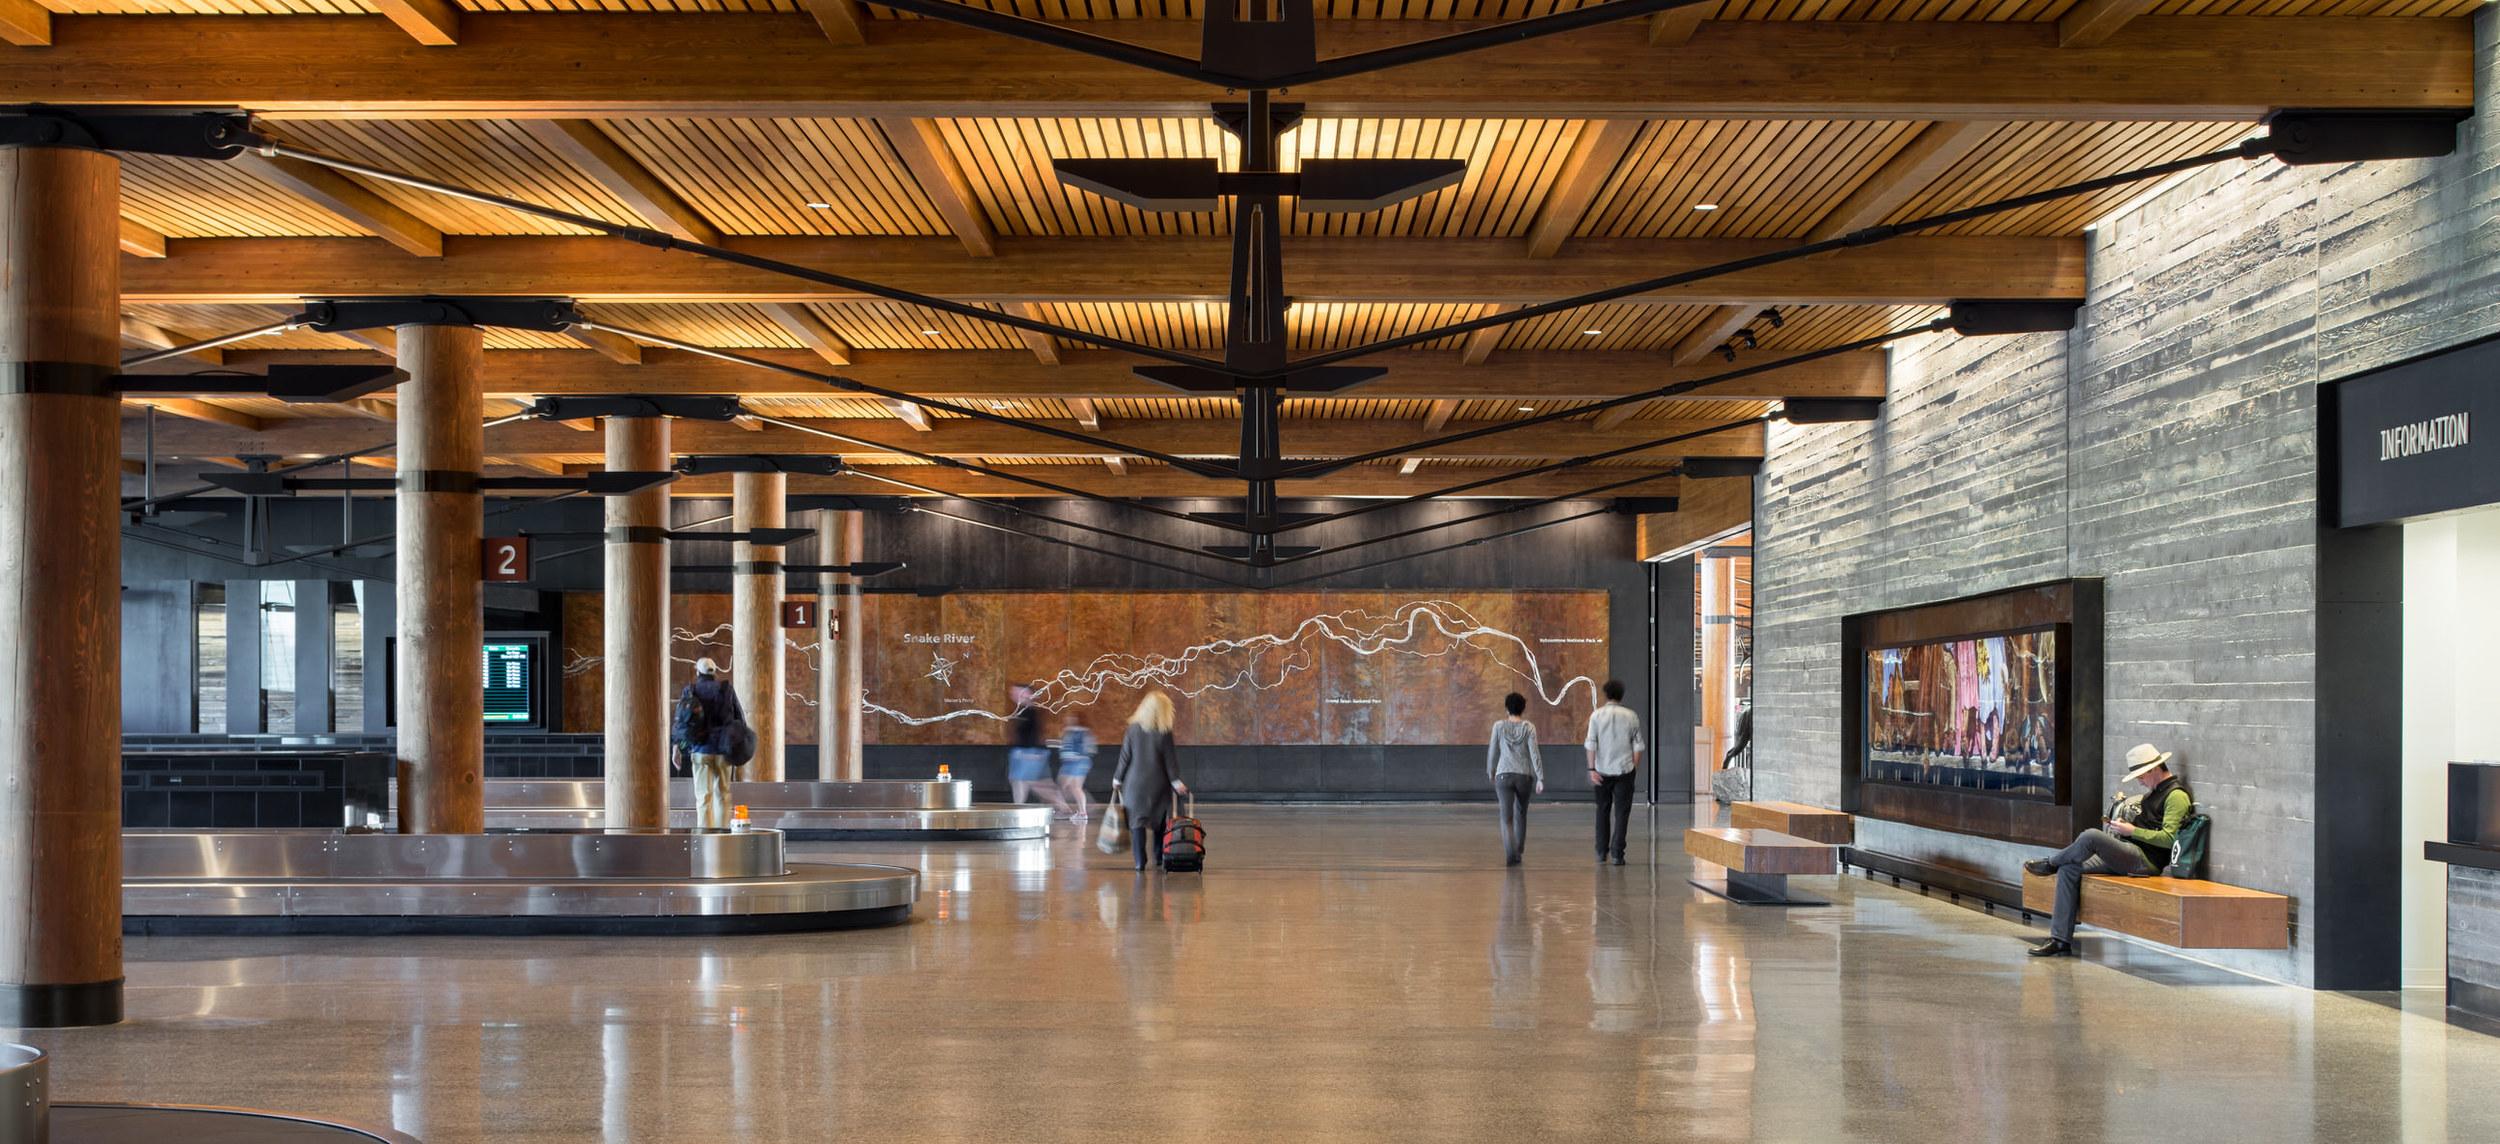 Jackson Hole Airport >> Jackson Hole Airport Cover Wadman Corporation